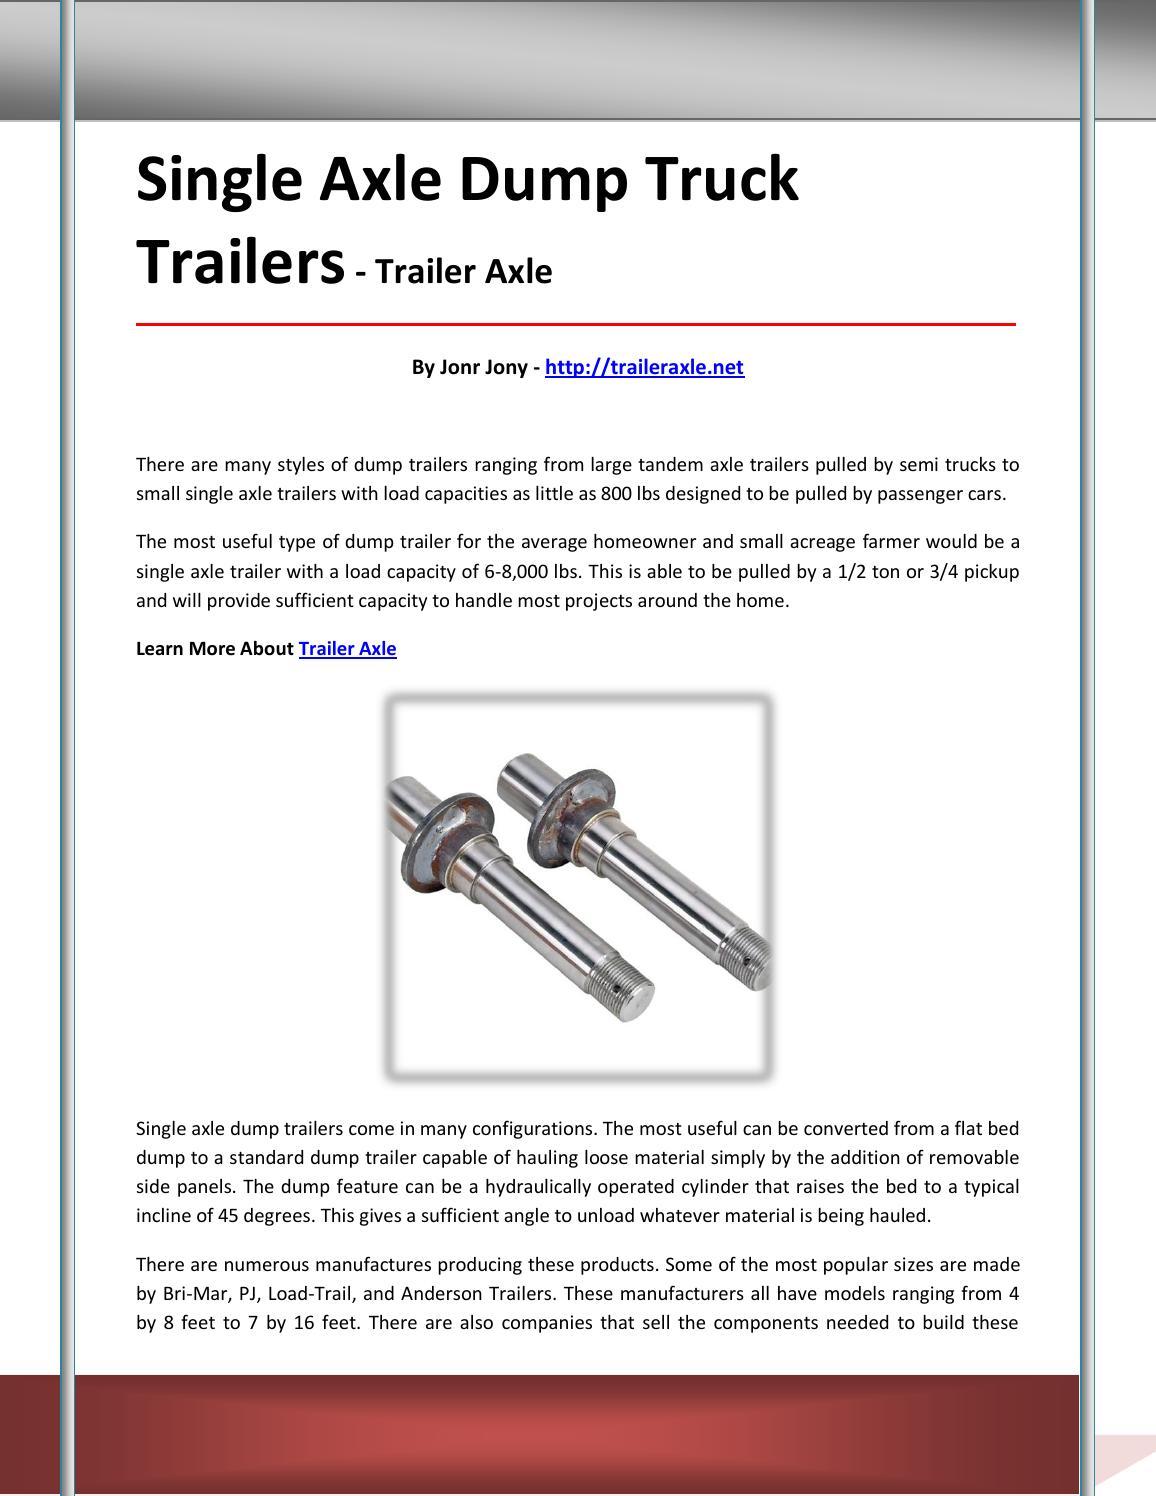 Trailer axle by vdfhrtjh - issuu